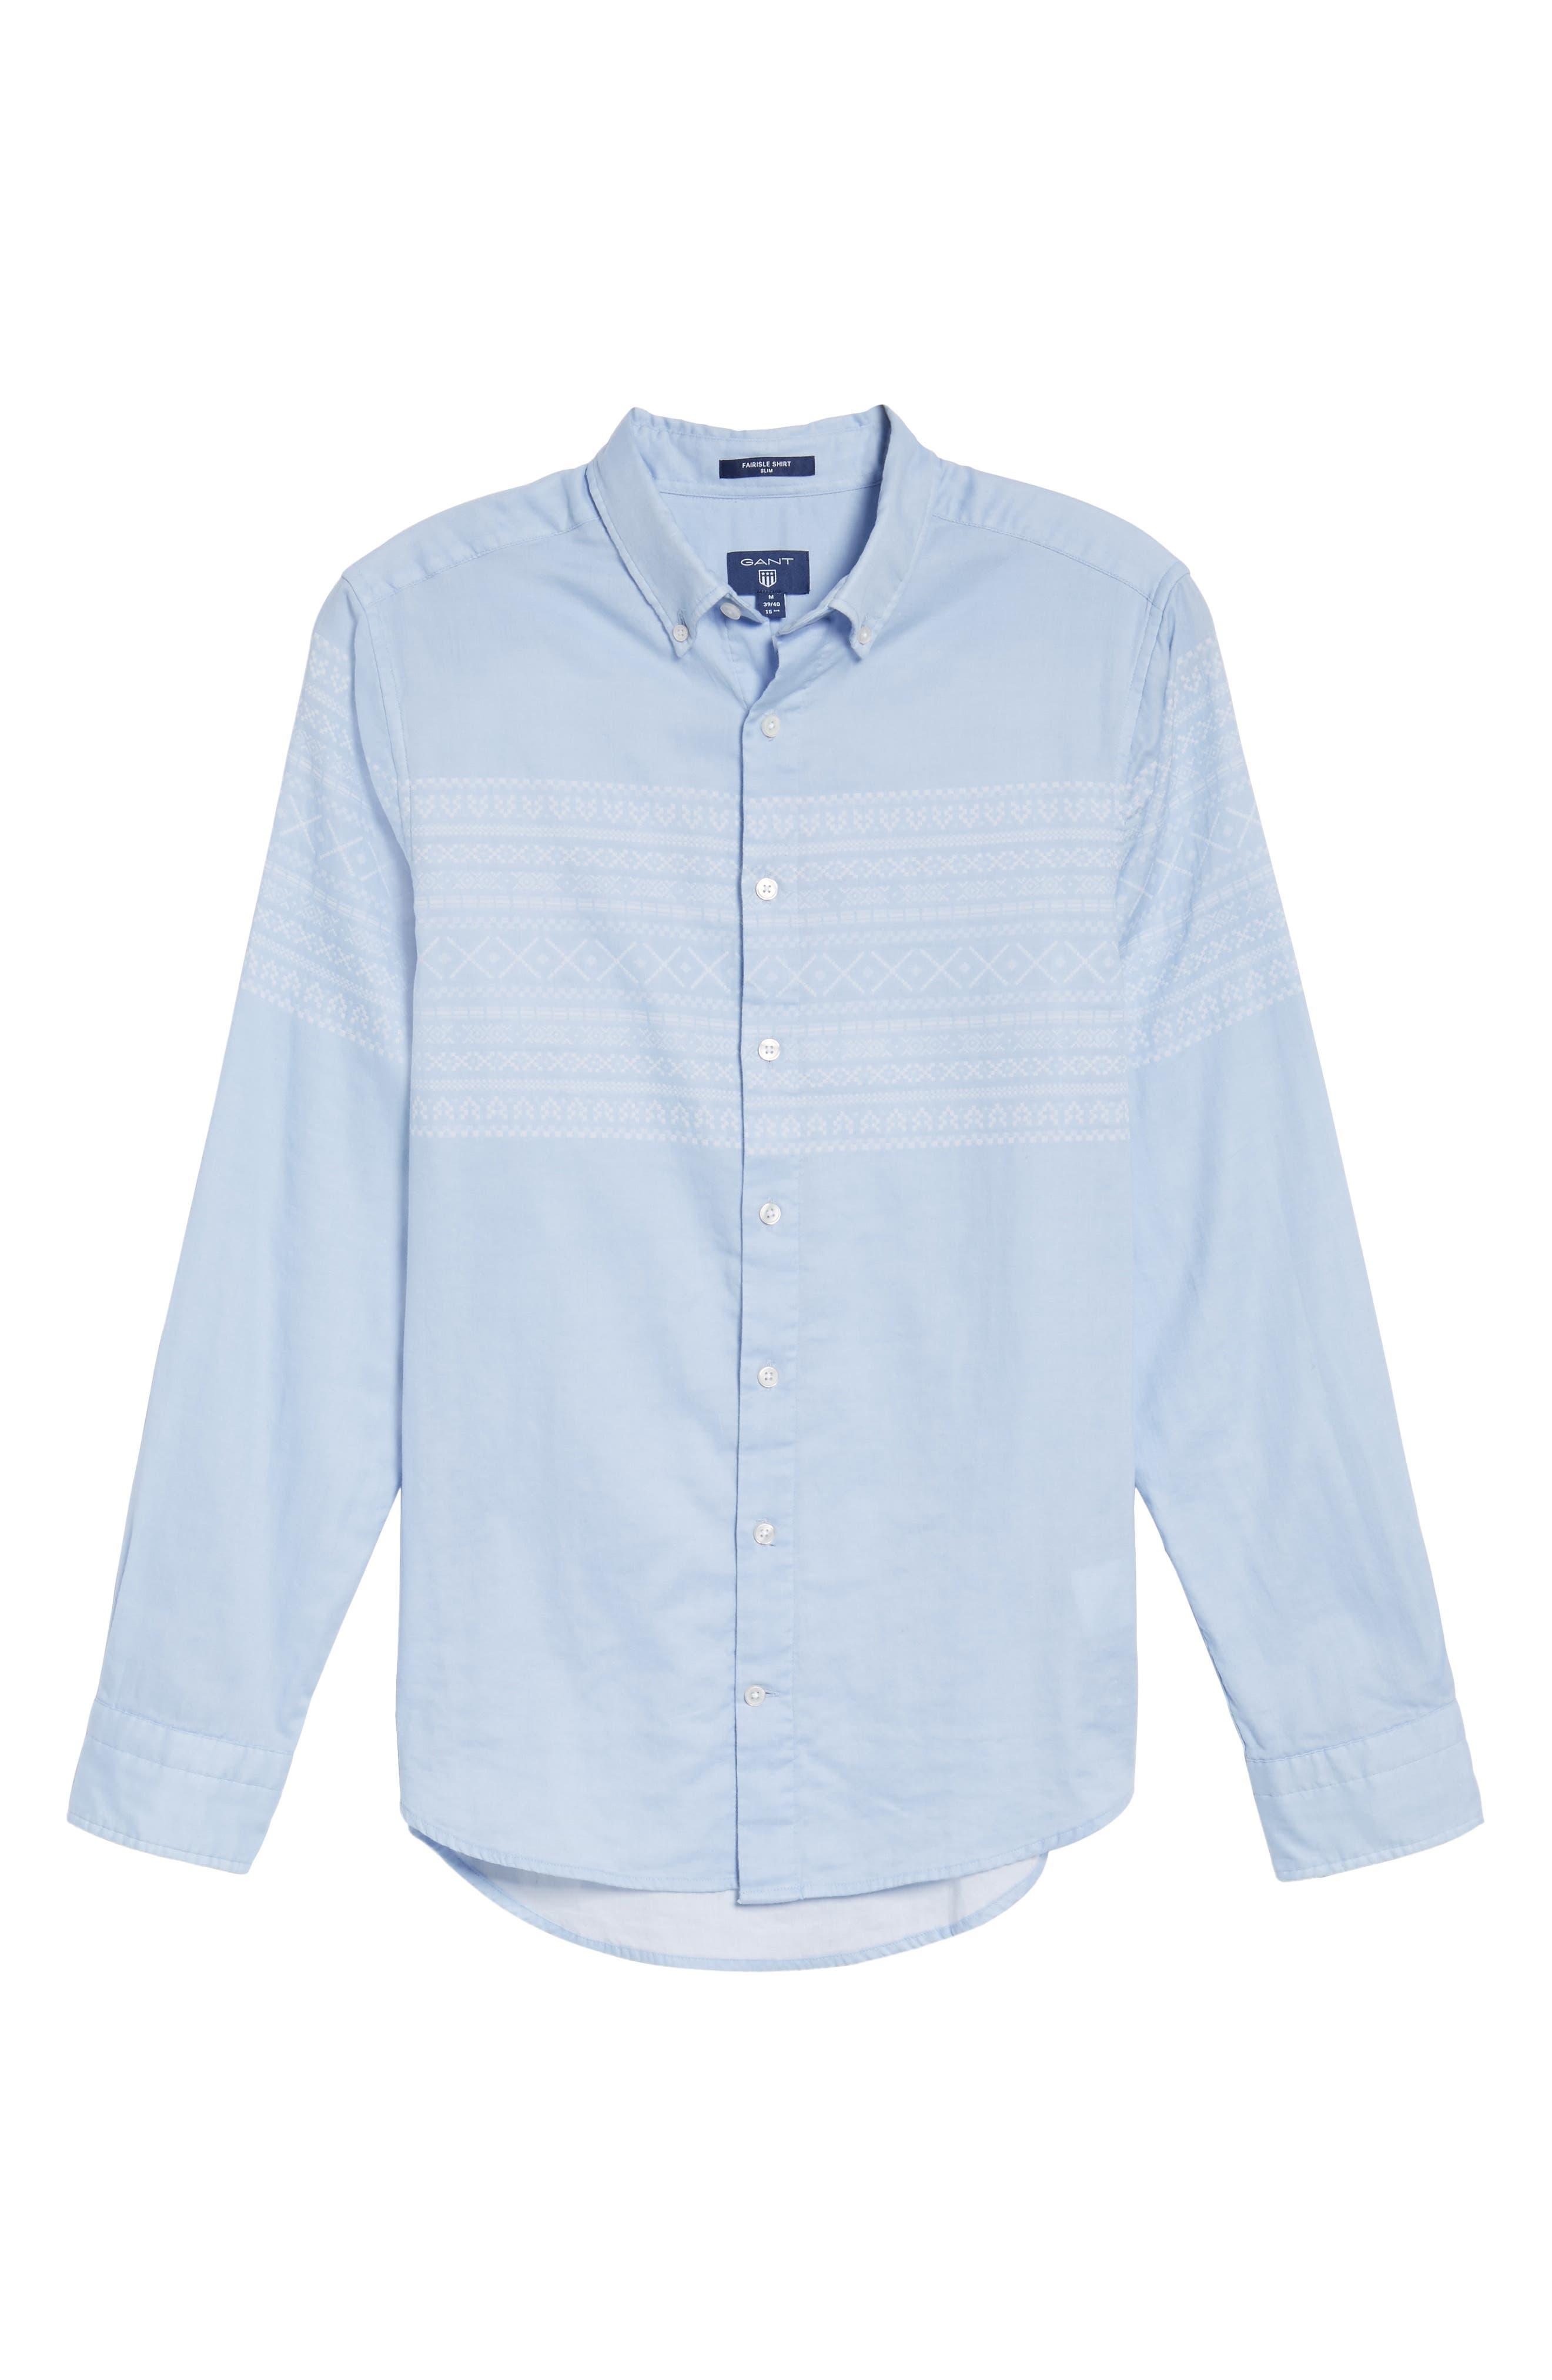 02 Extra Slim Fit Fair Isle Print Sport Shirt,                             Alternate thumbnail 6, color,                             420